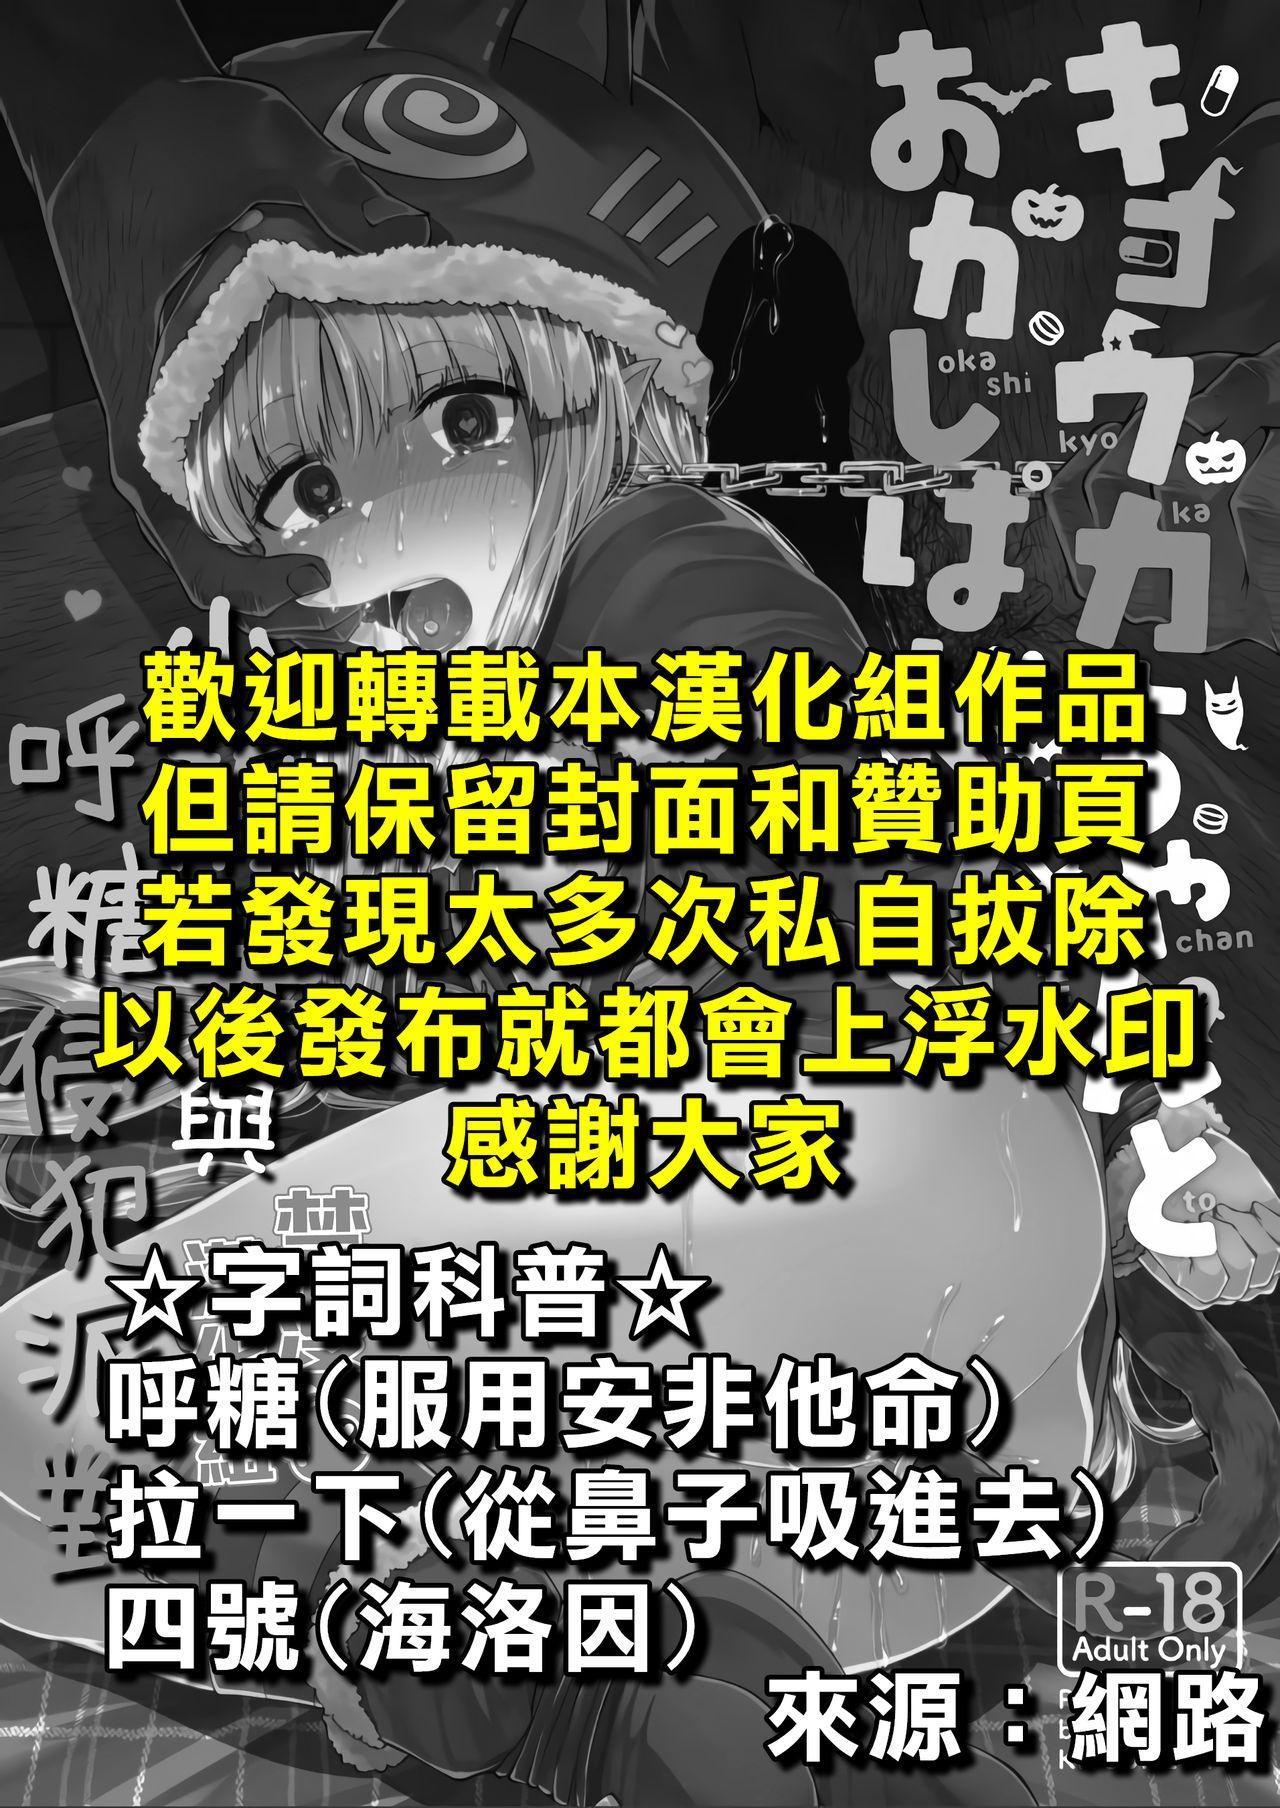 Kyouka-chan to Okashi Party | 小靜華與呼糖侵犯派對 1